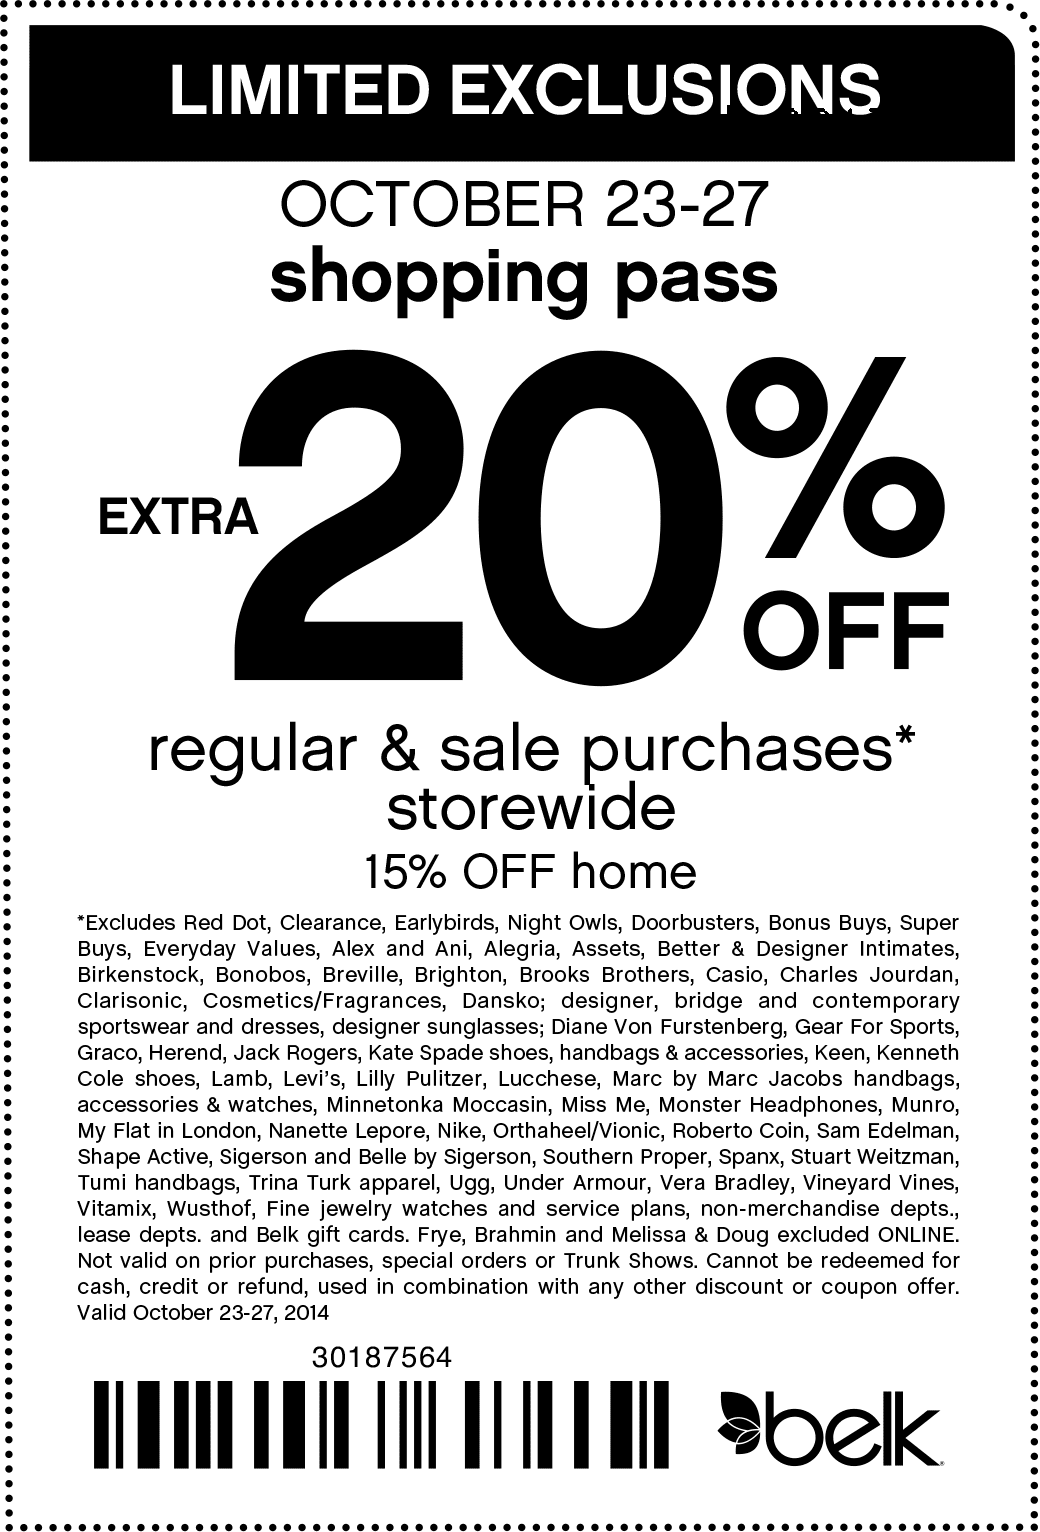 Belk coupons for perfume